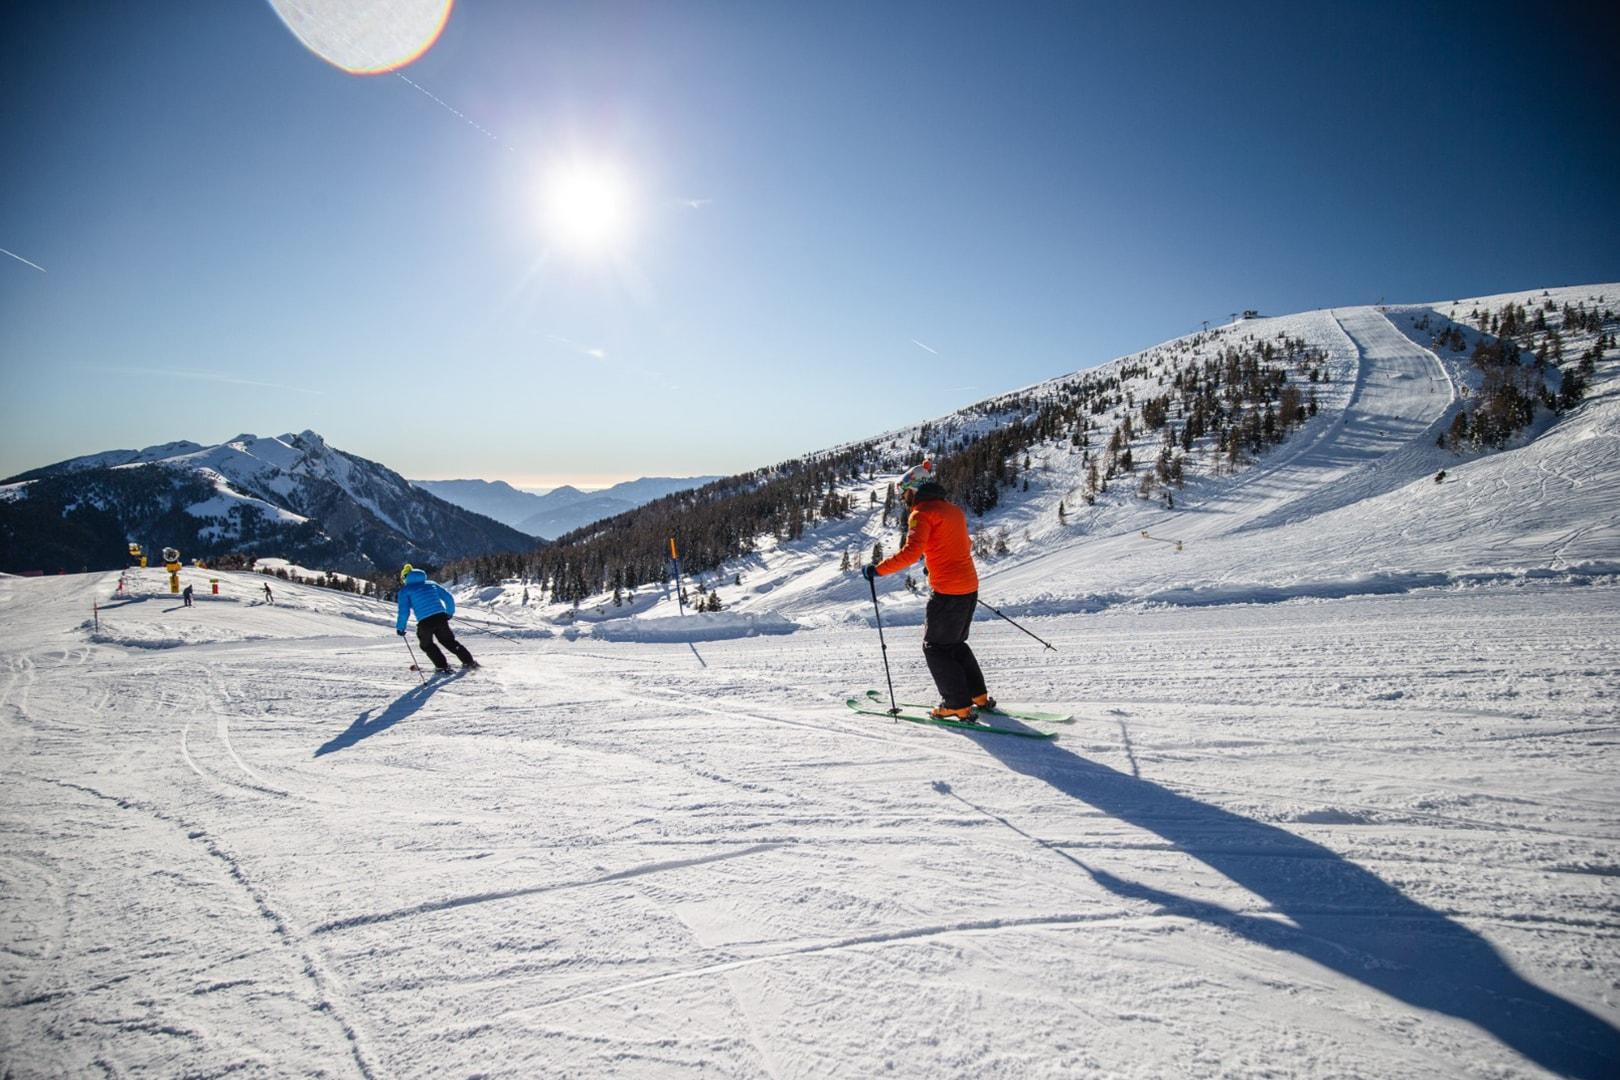 ski area Funivie Lagorai a Passo Brocon 5